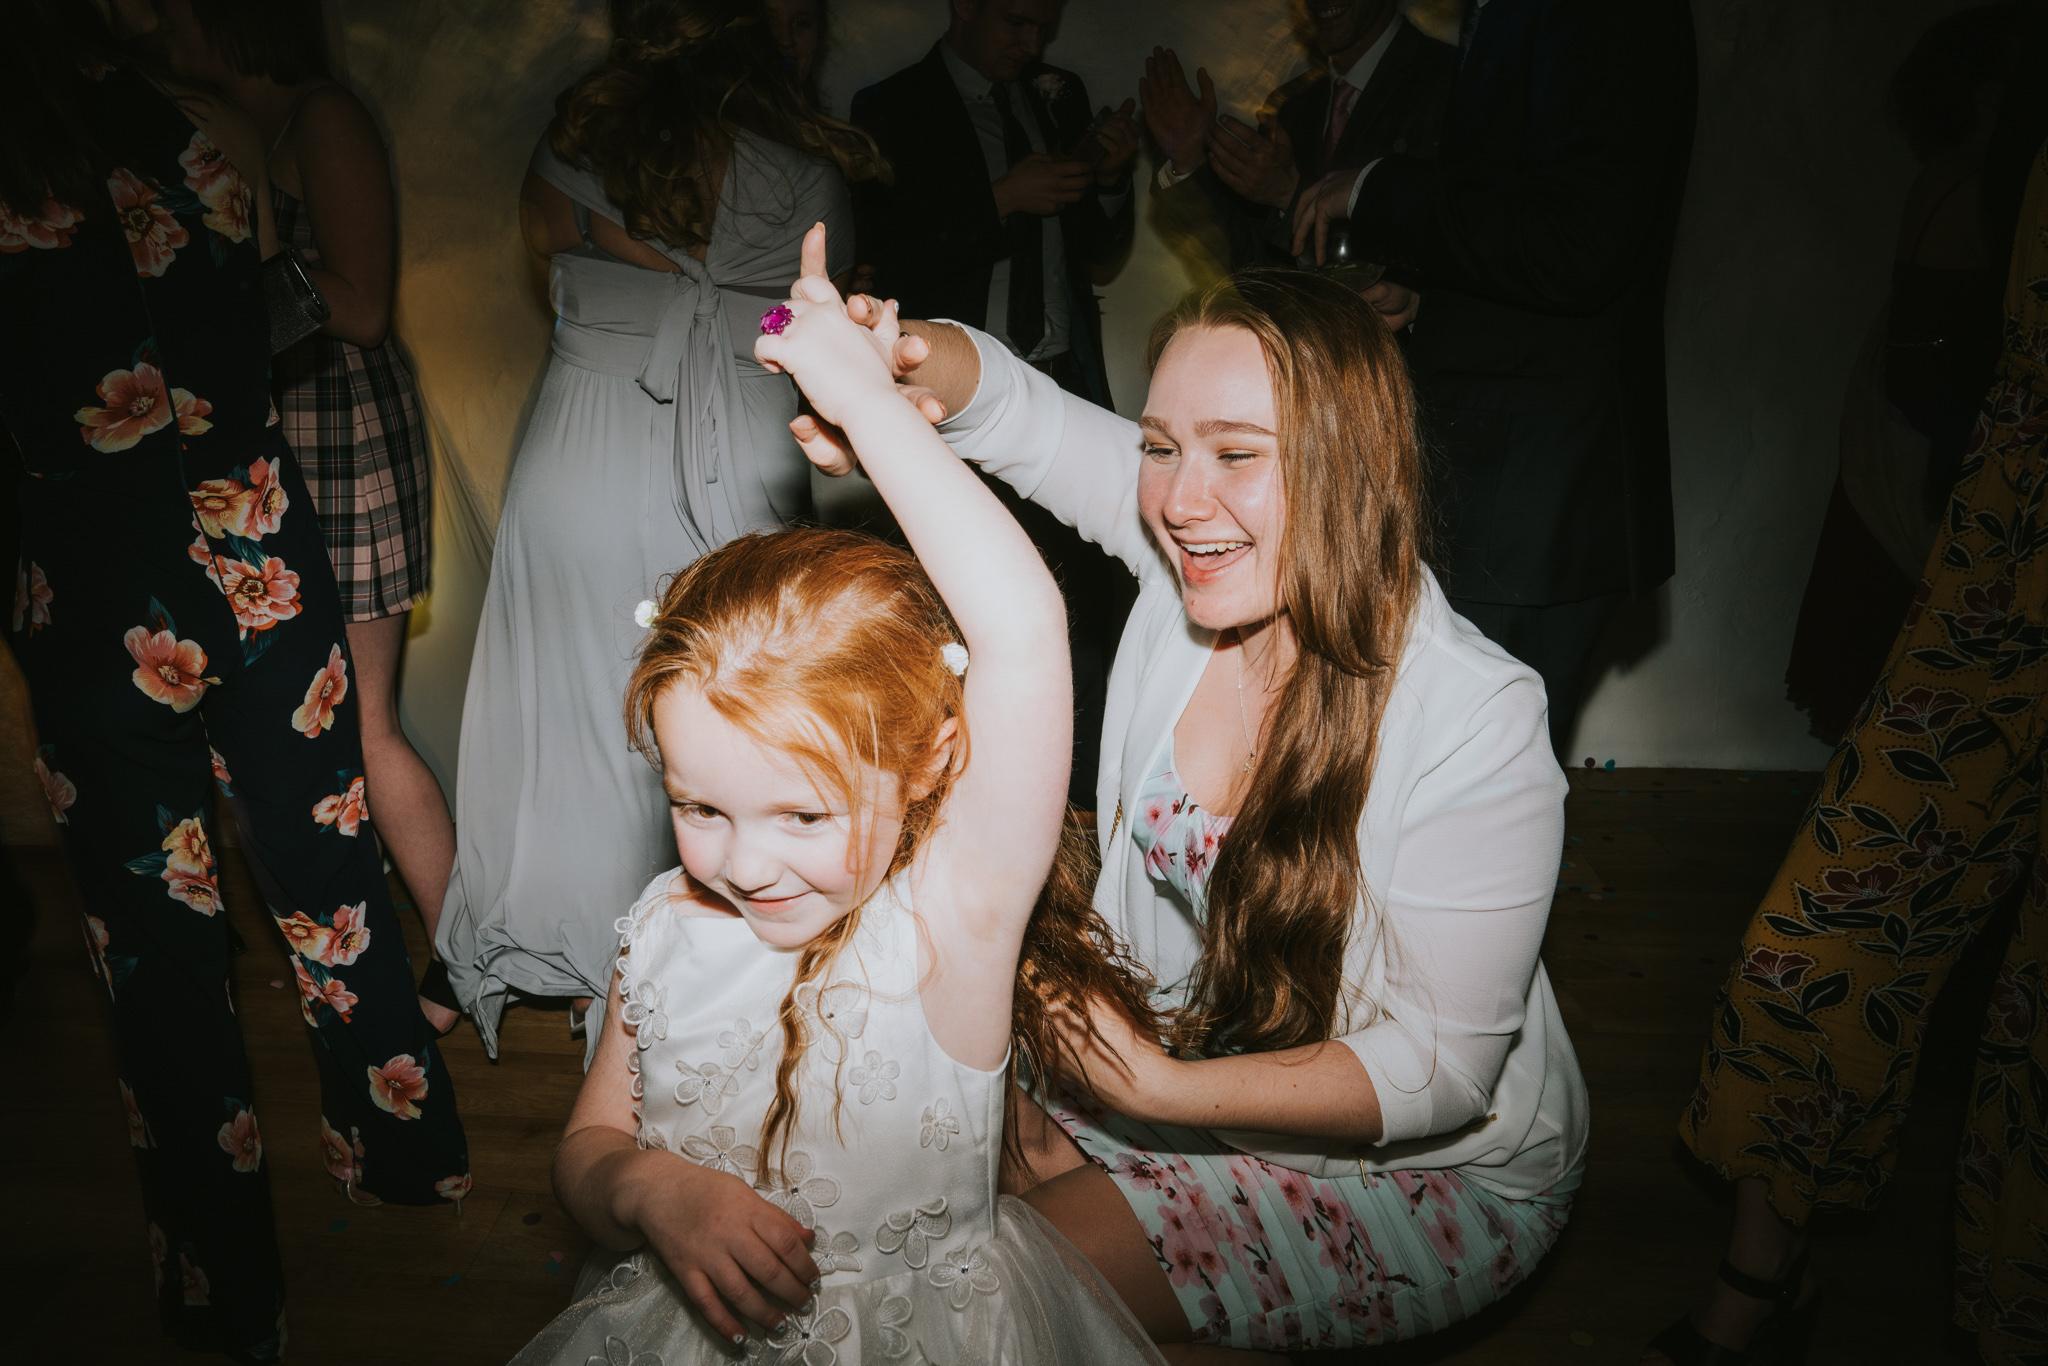 grace-sam-old-barn-clovelly-devon-wedding-photographer-grace-elizabeth-essex-suffolk-norfolk-wedding-photographer (122 of 132).jpg